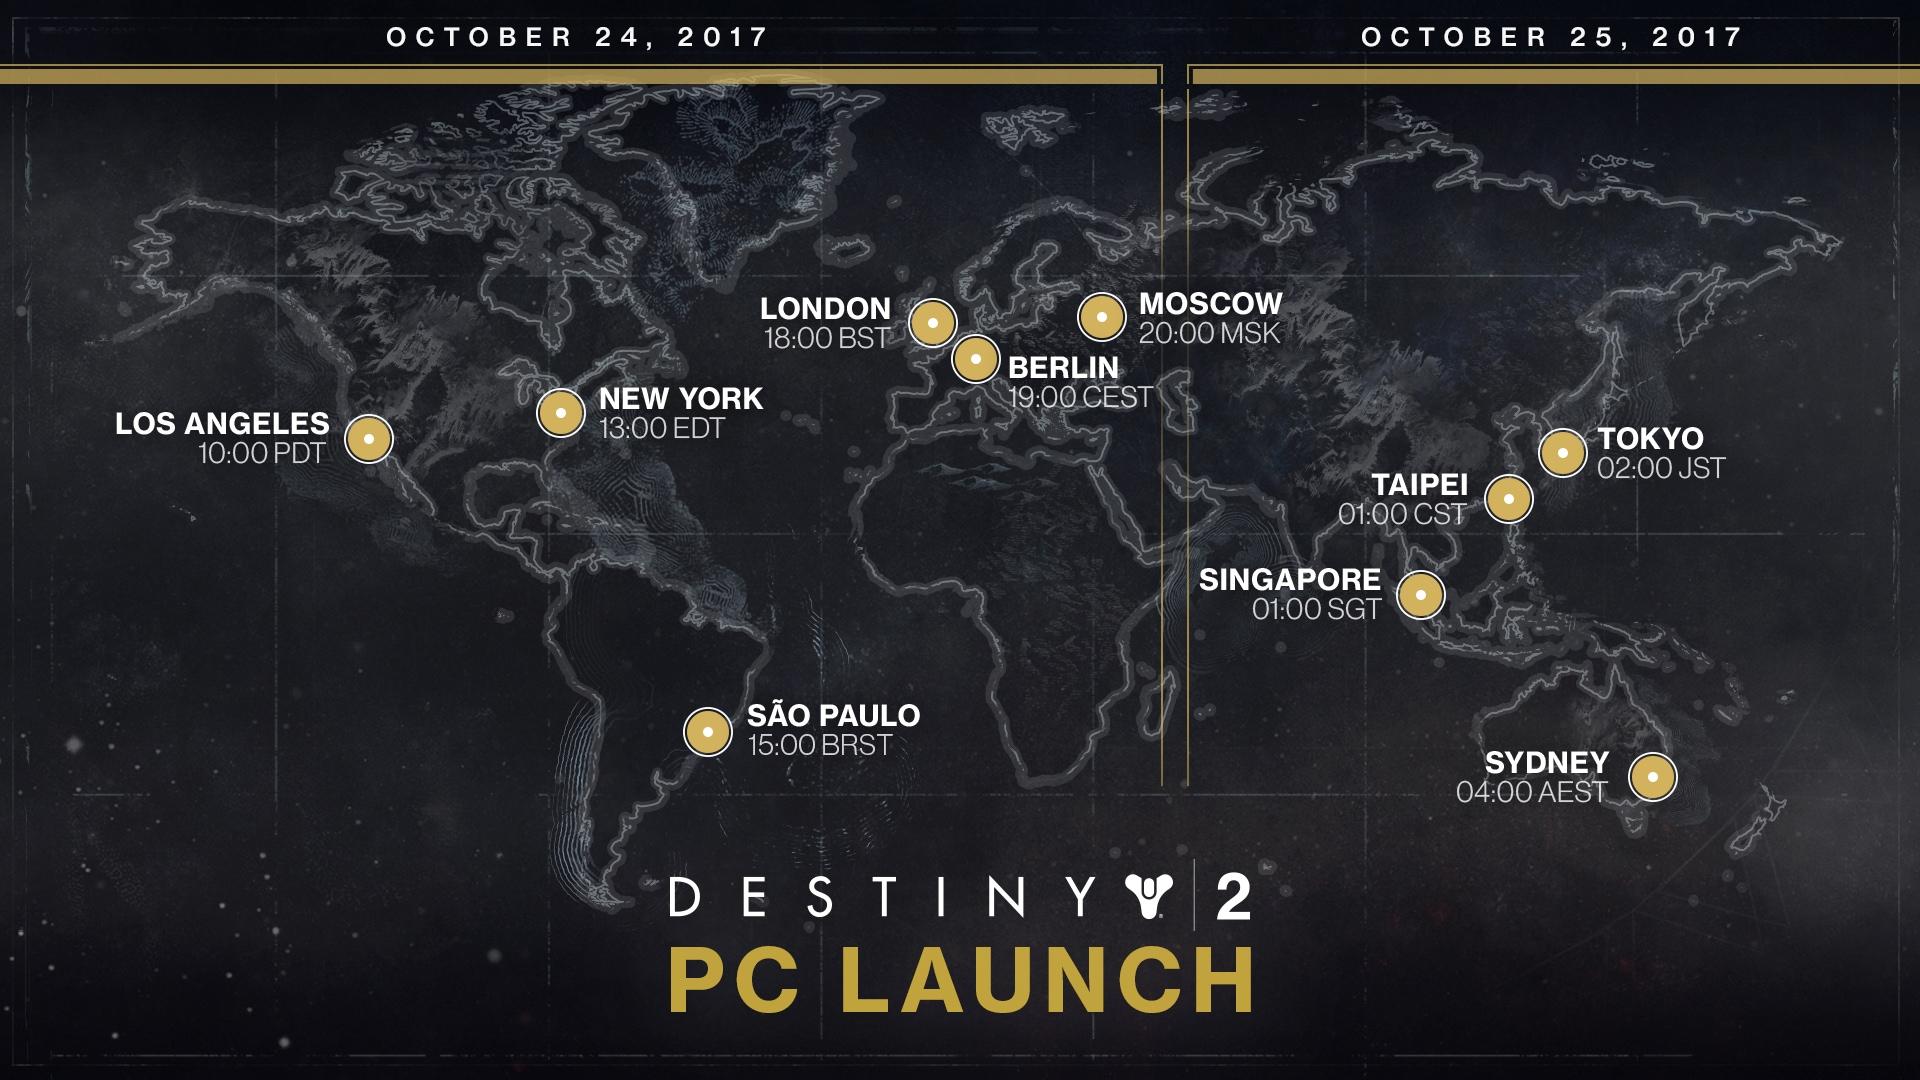 1b3fbe19ae1 Destiny 2 PC Launch Draws Near—Preload Now! — All News — Blizzard News